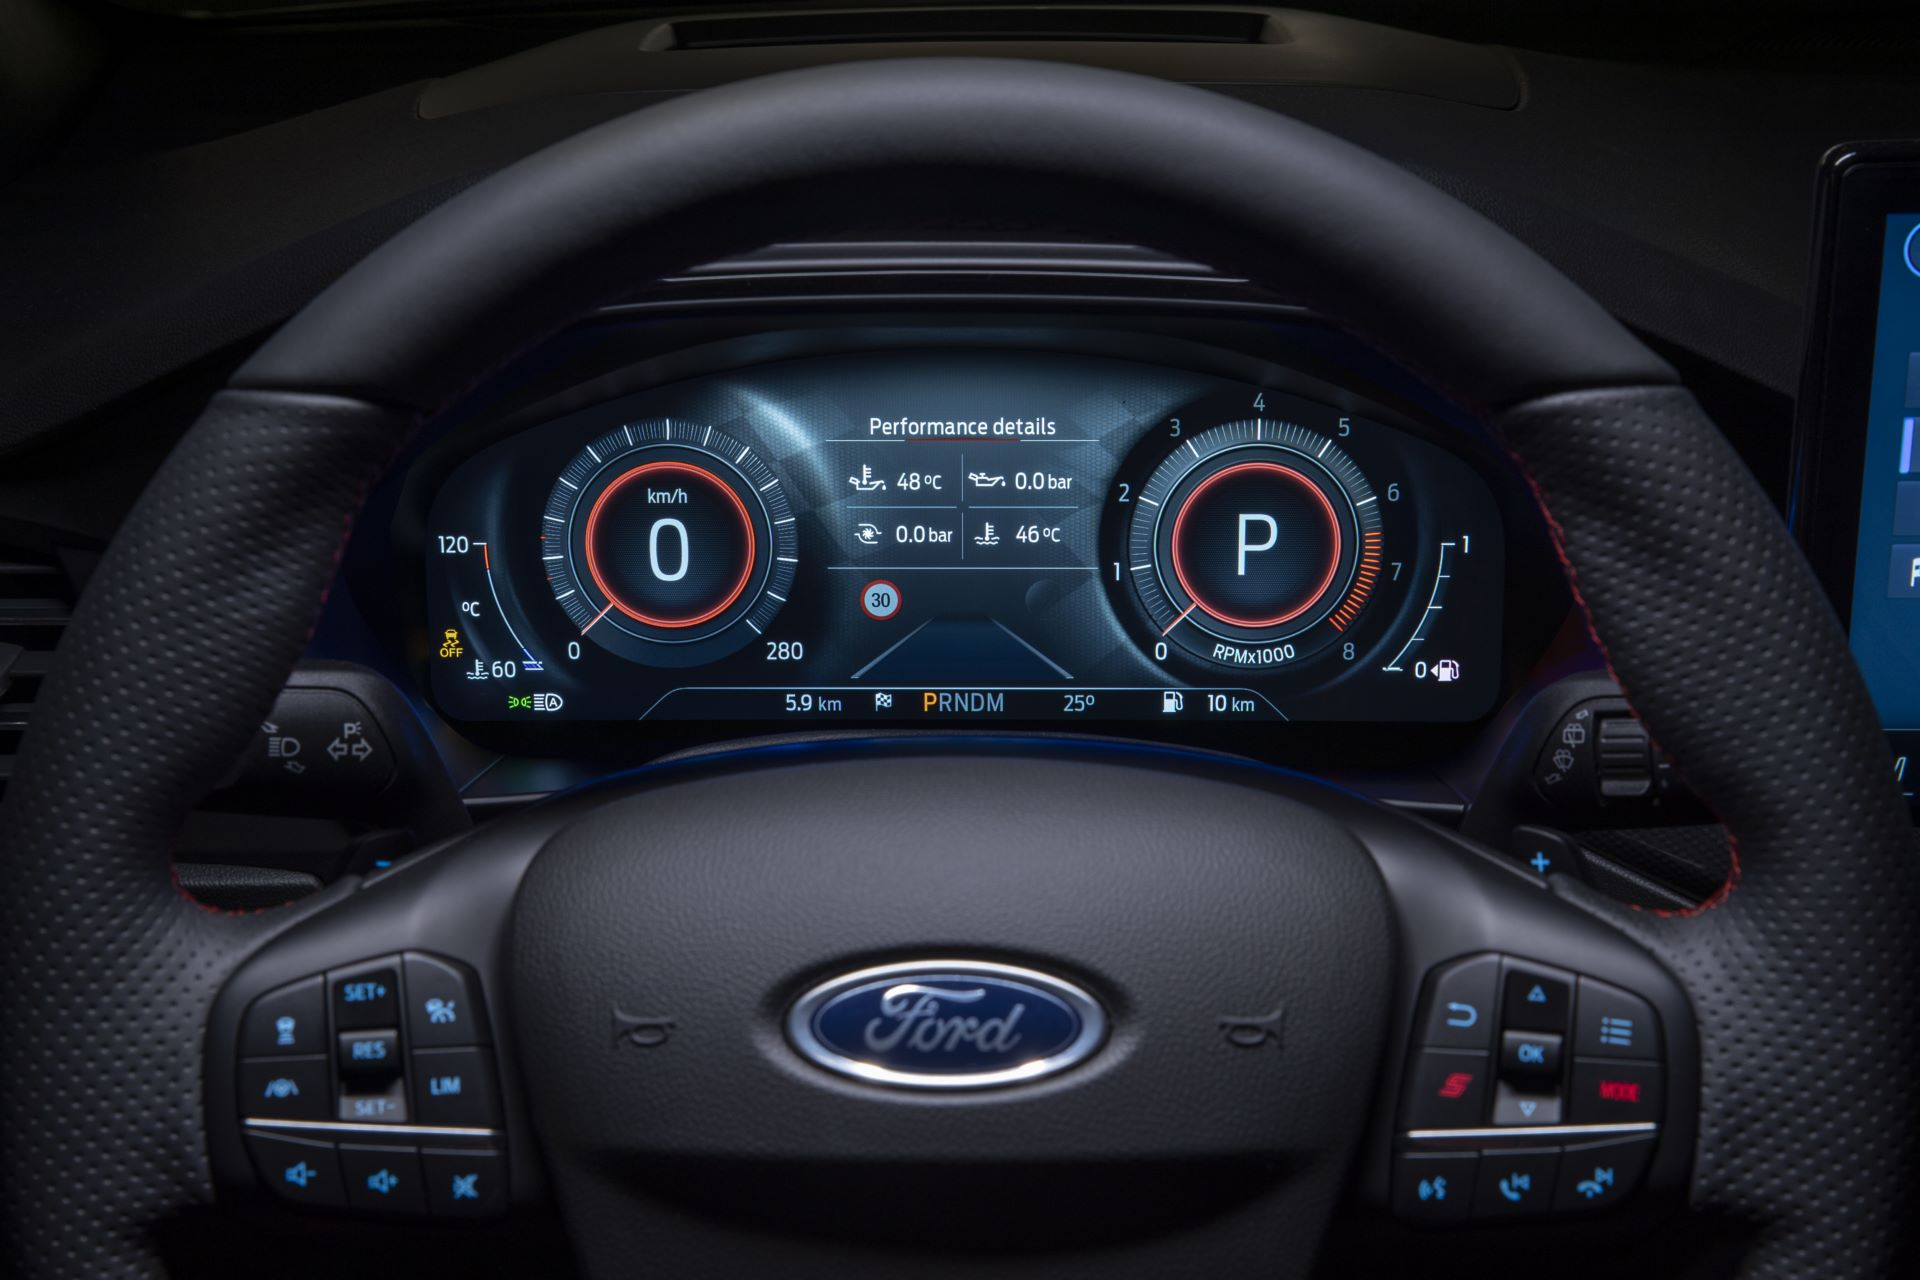 Ford-Focus-ST-facelift-2021-9